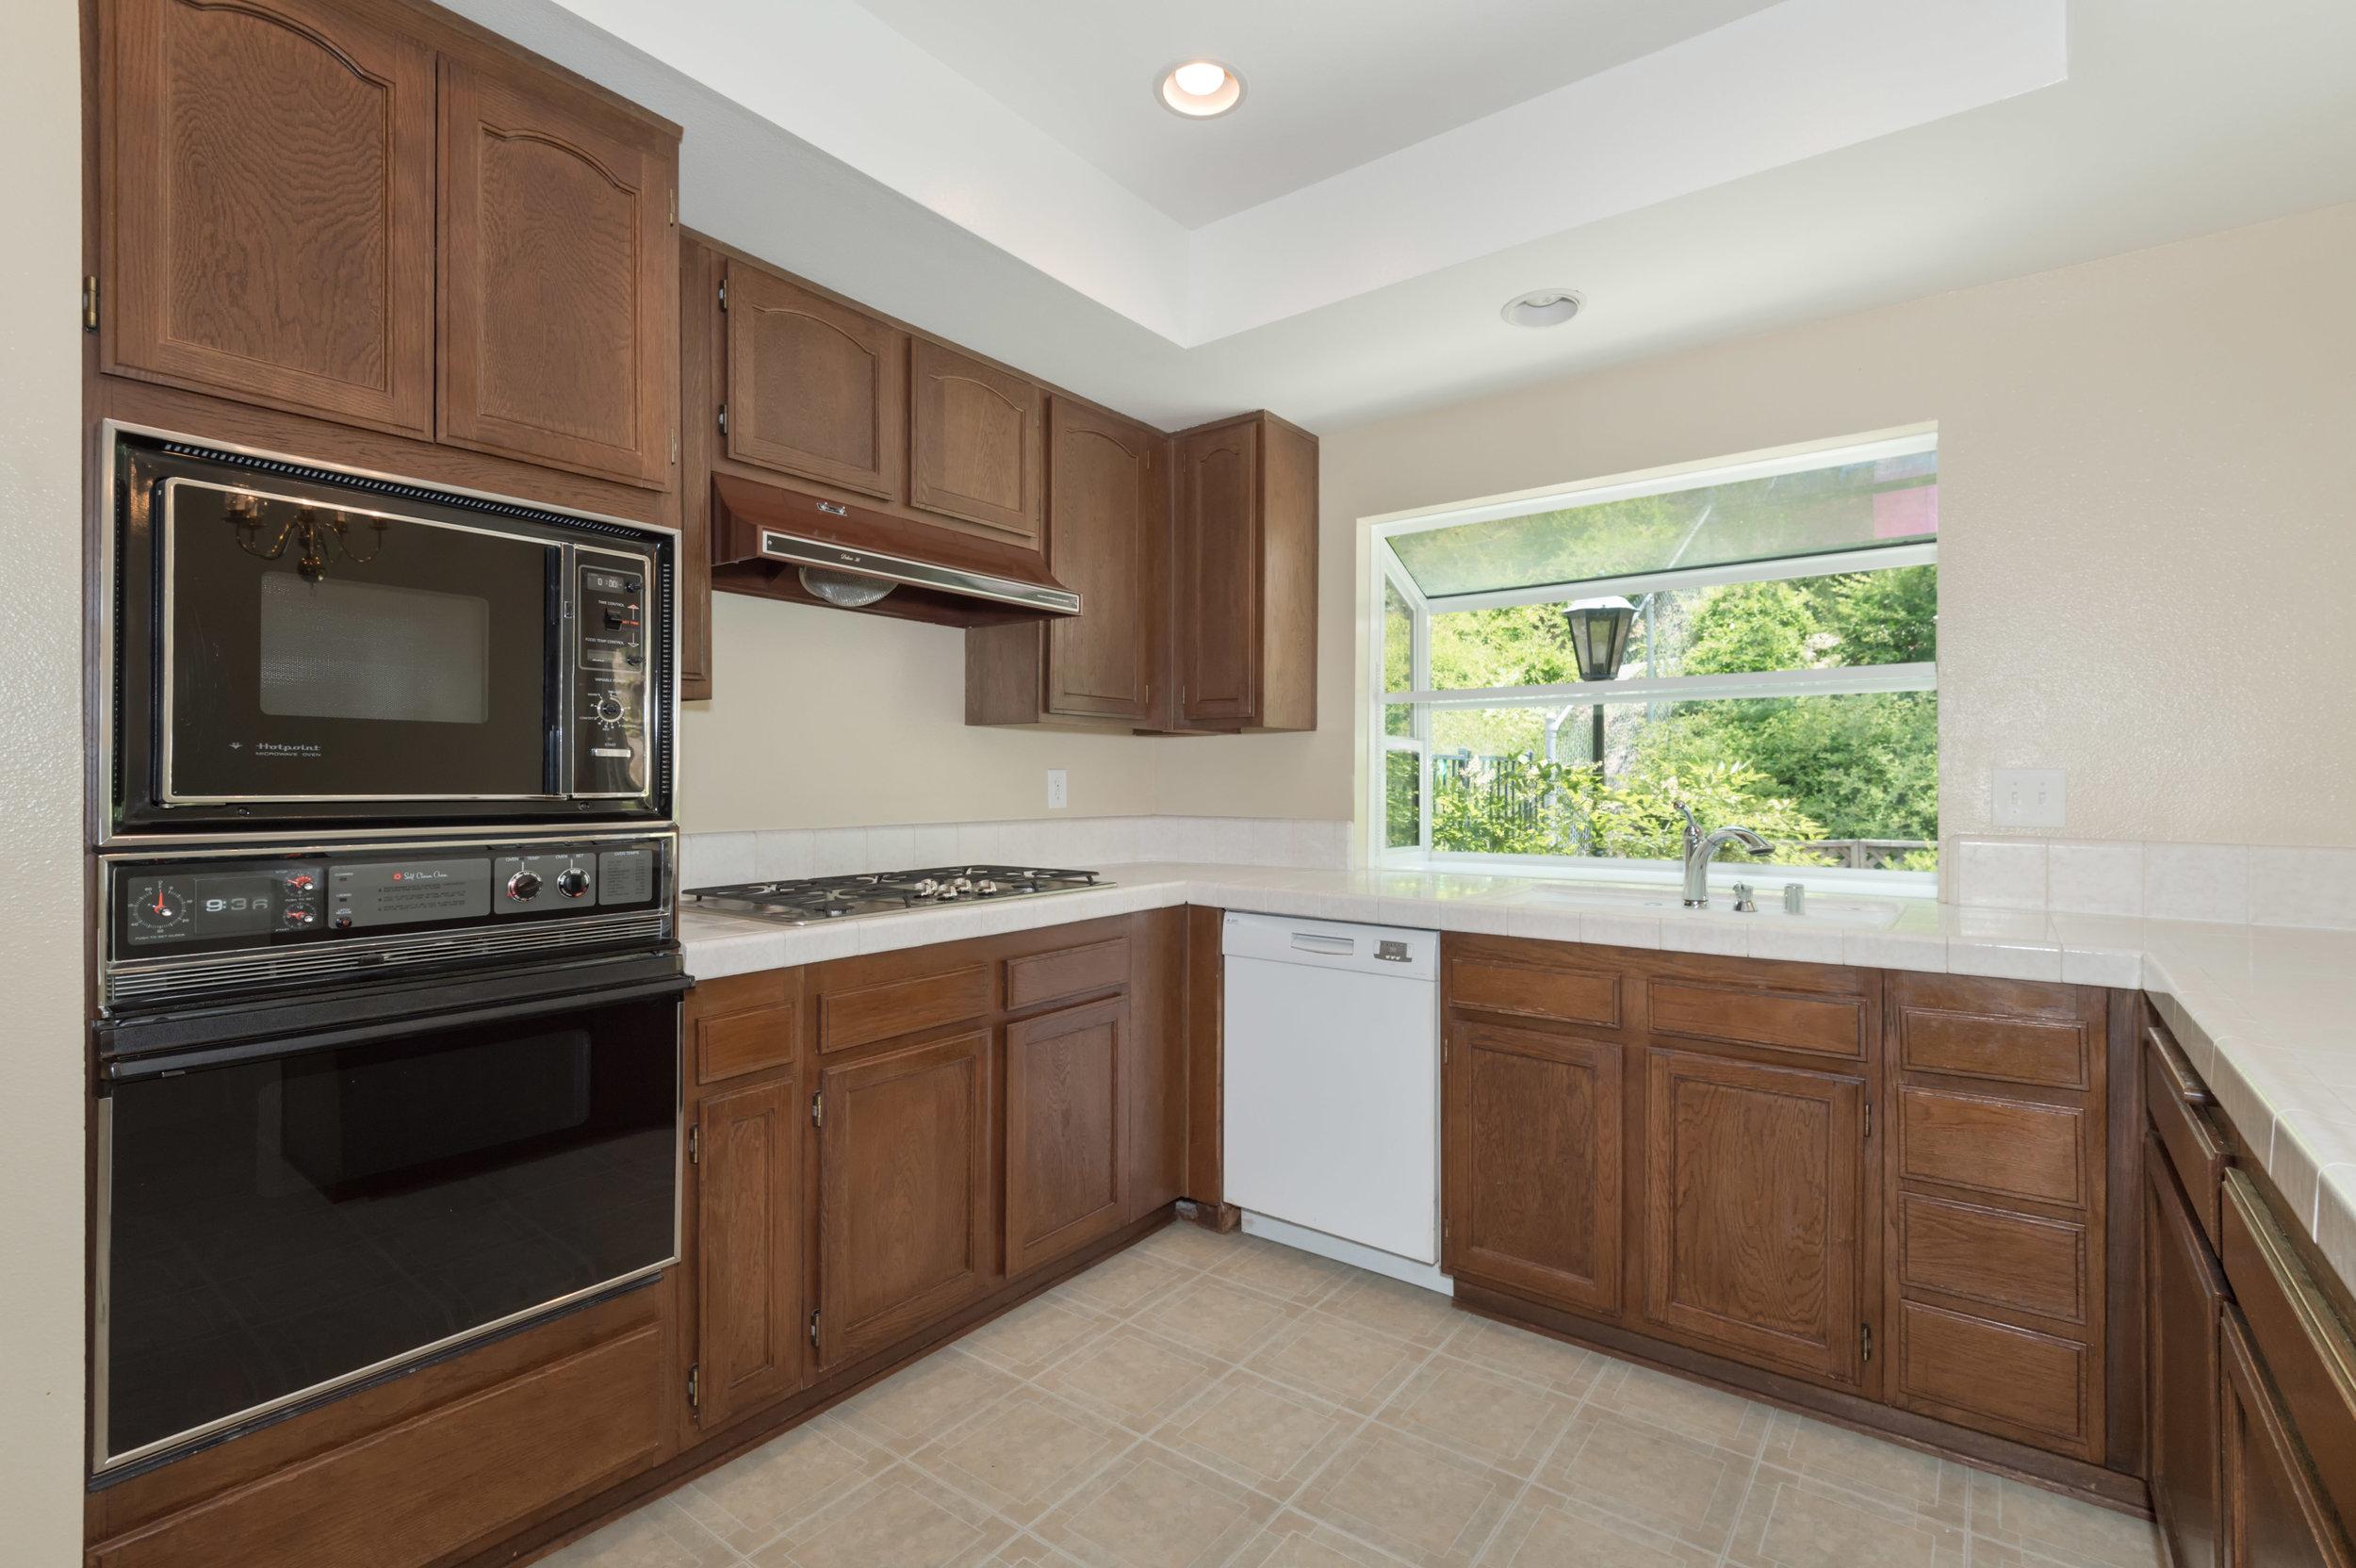 012 kitchen 8832 Moorcroft Avenue West Hills For Sale Lease The Malibu Life Team Luxury Real Estate.jpg